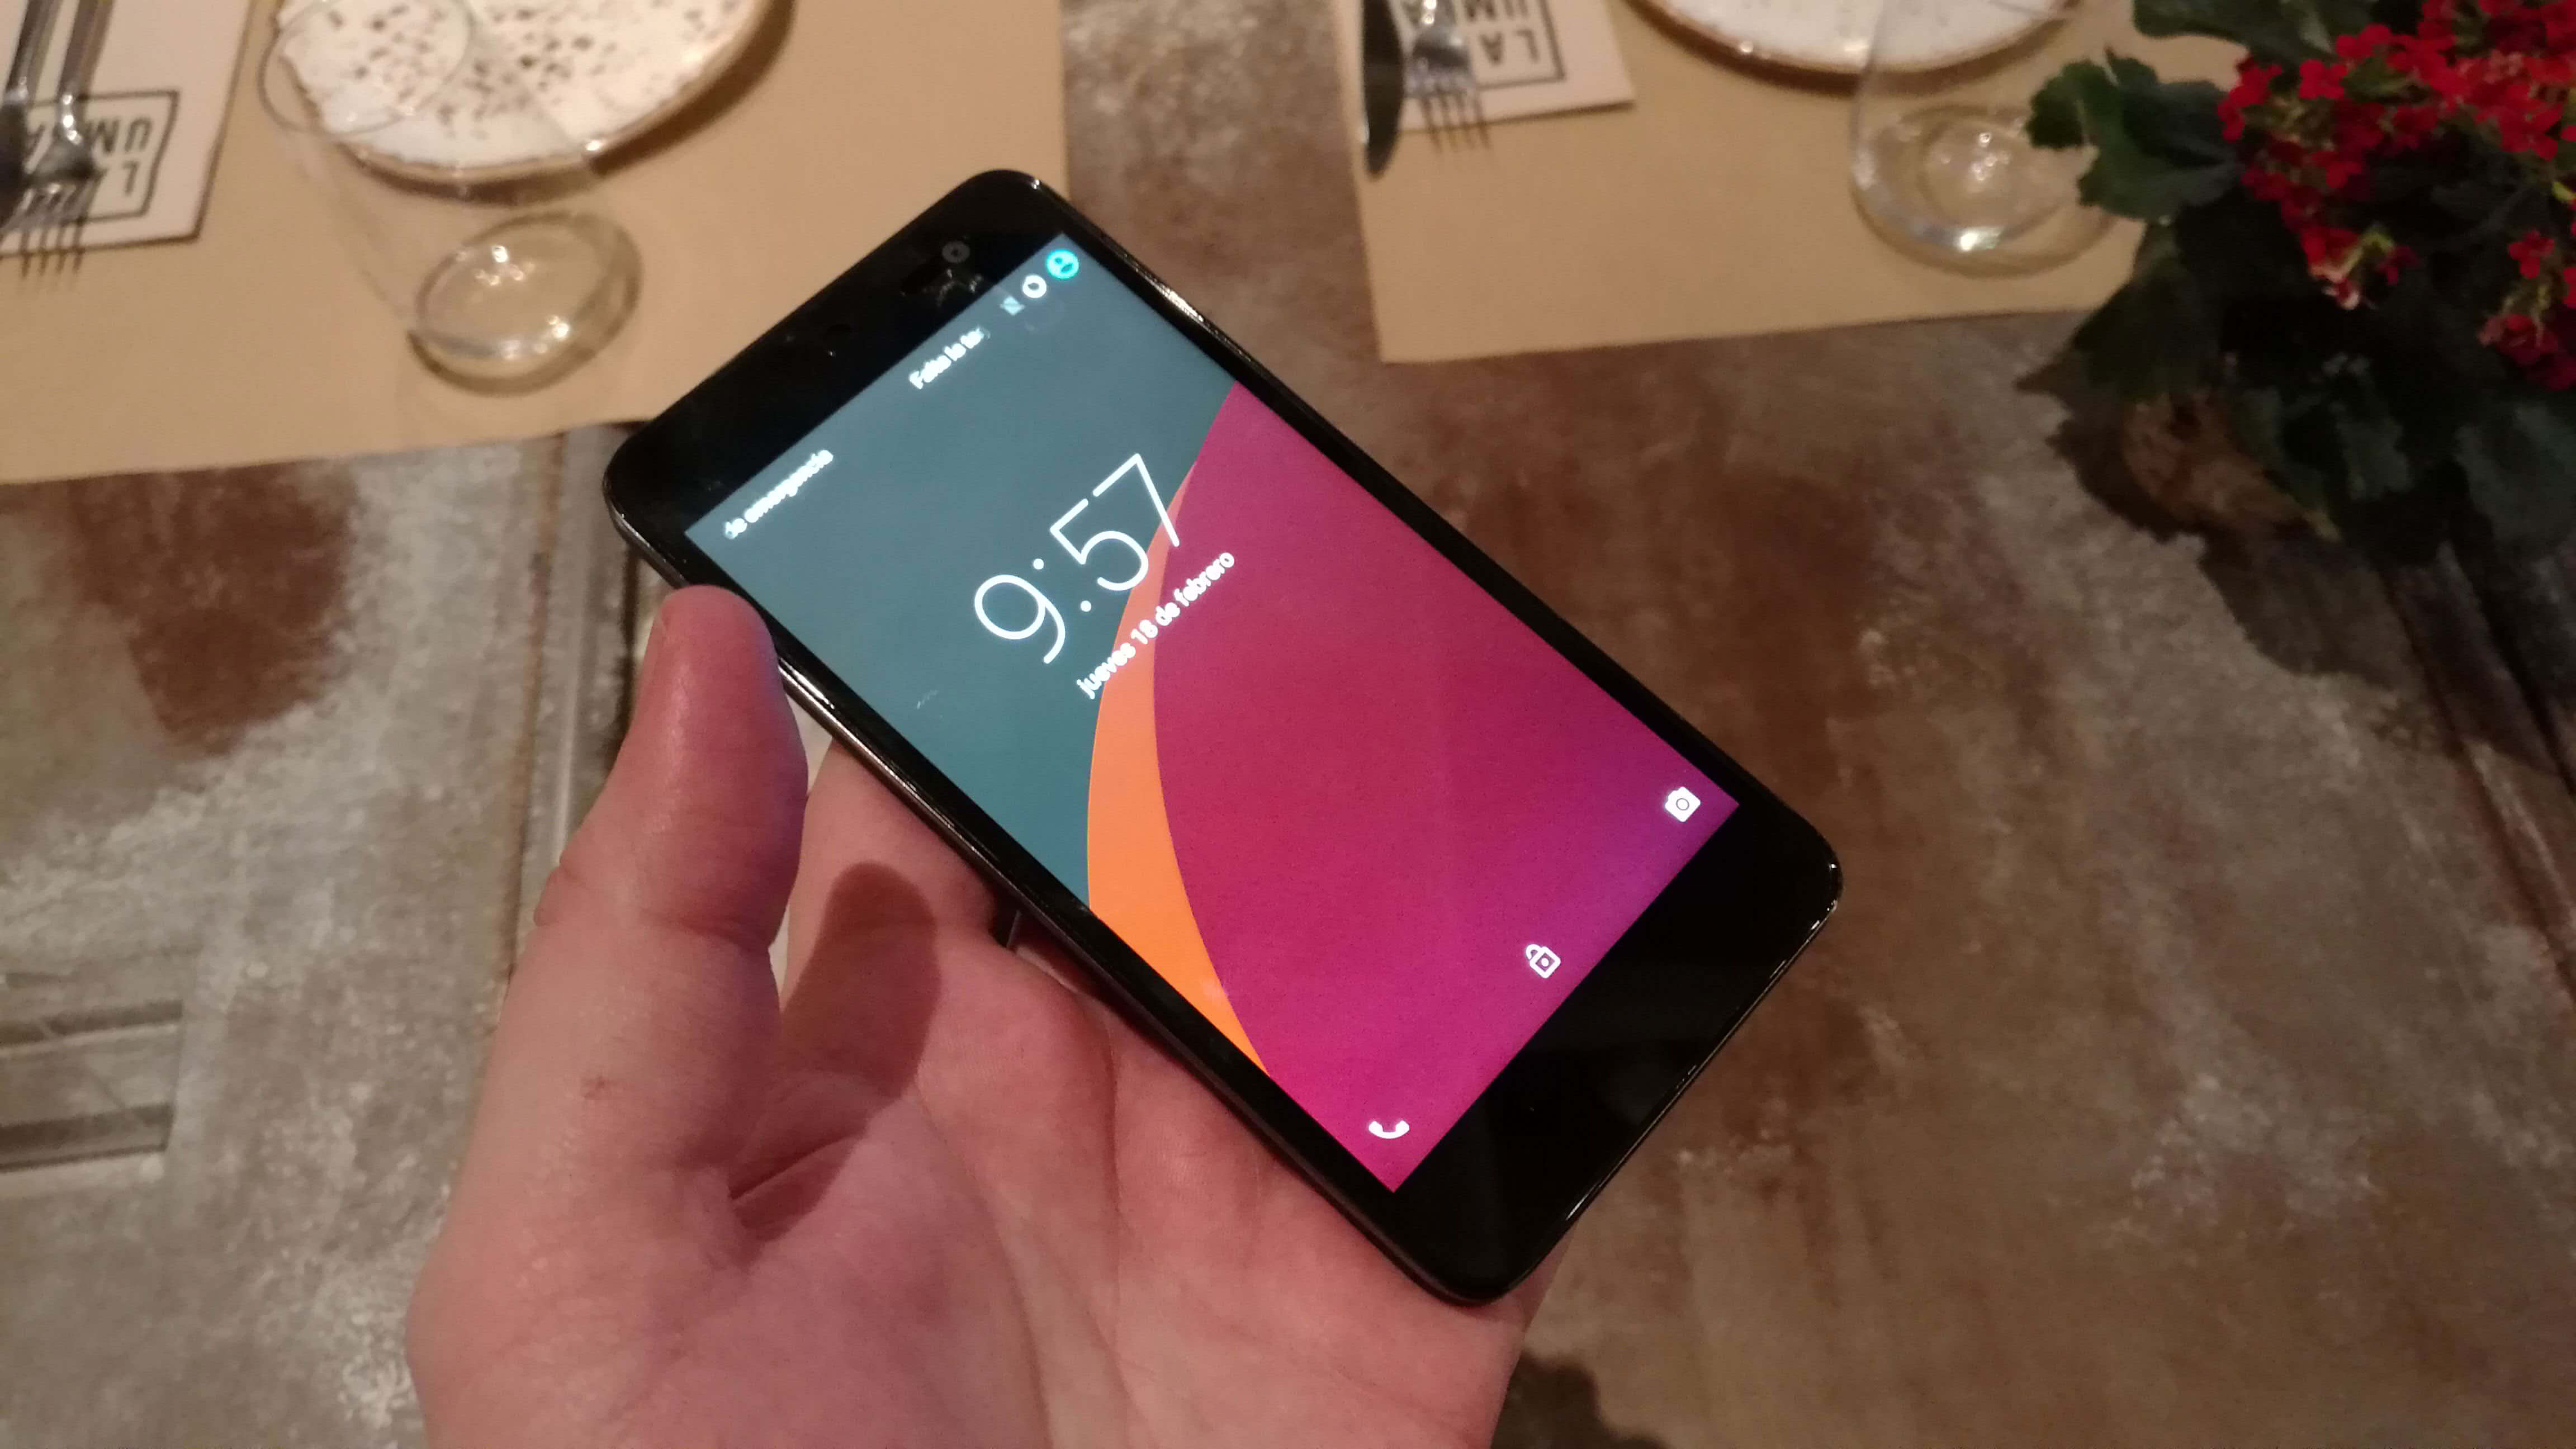 Teléfono WileyFox con sistema operativo Cyanogen OS